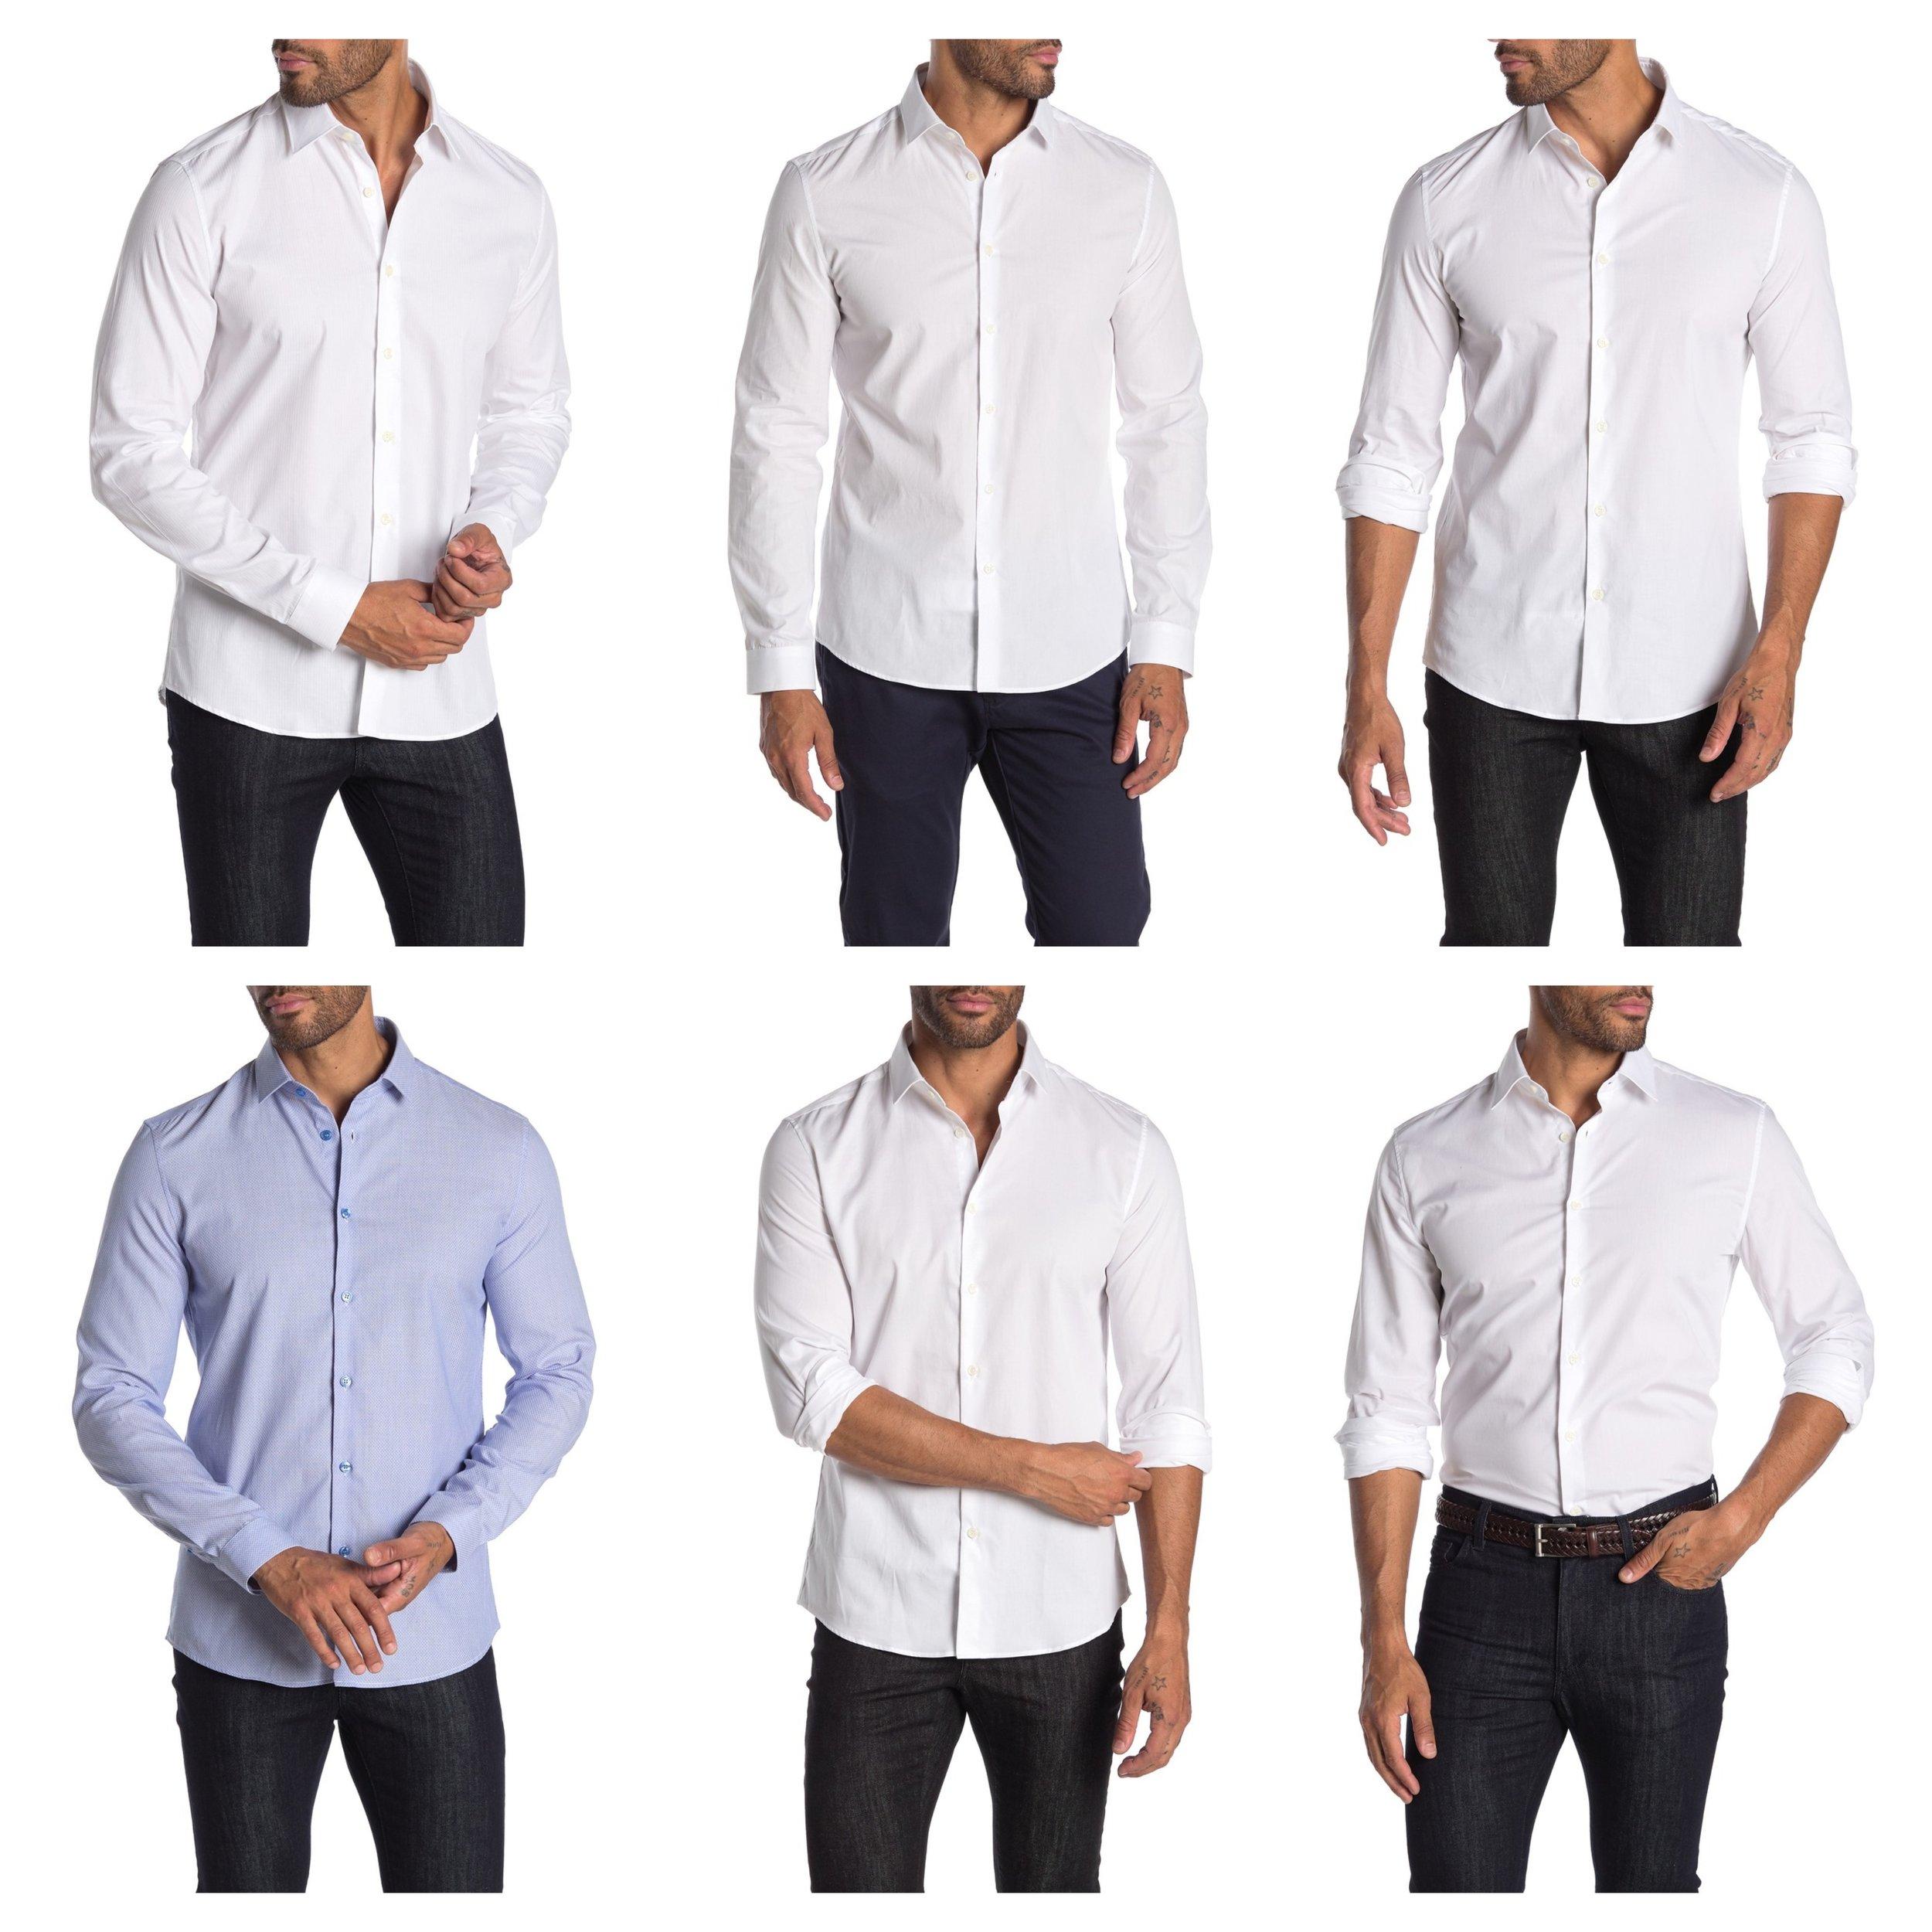 Versace-Shirts.jpg